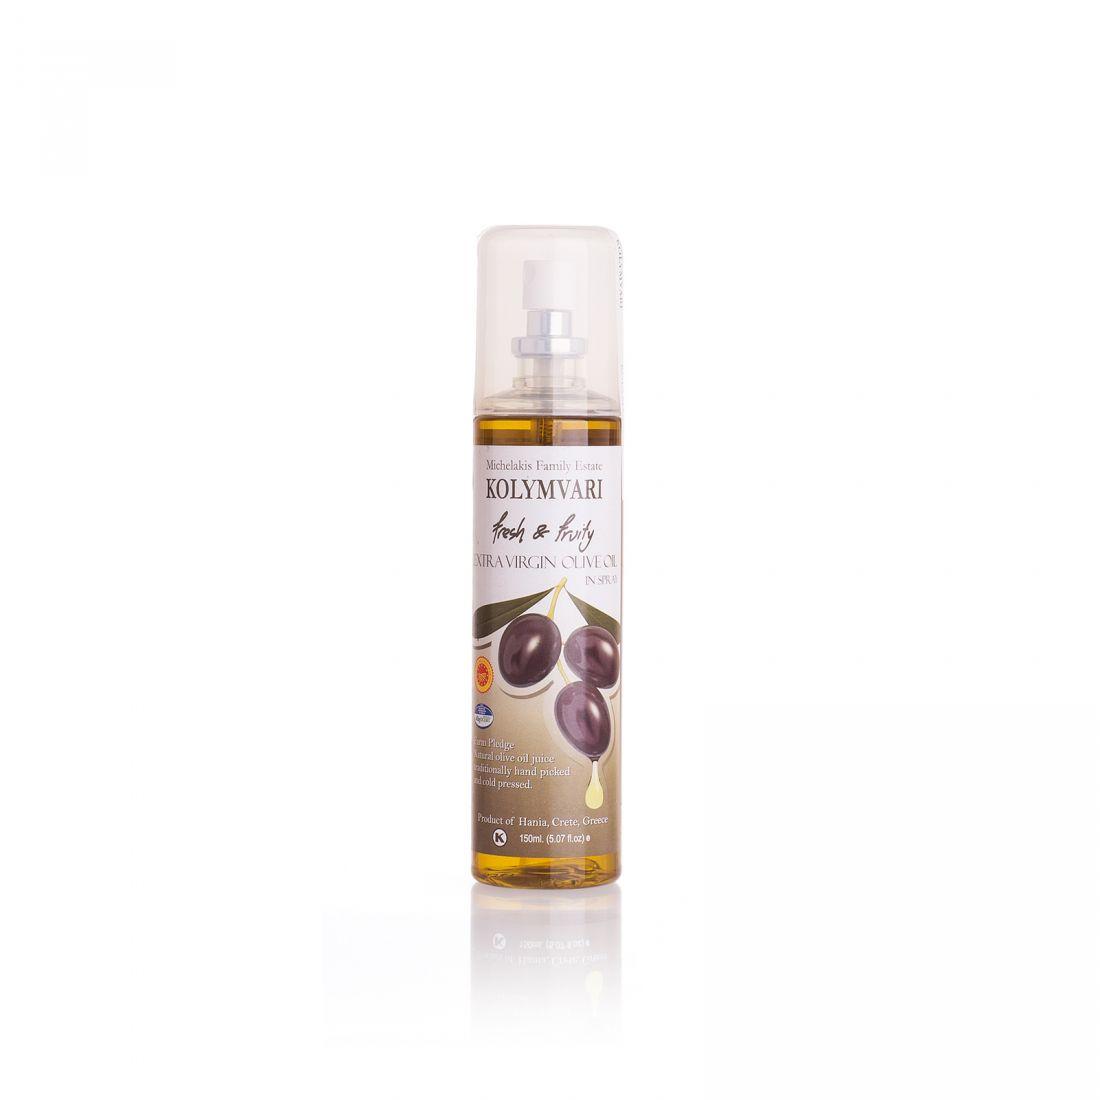 Оливковое масло KOLYMVARI  - 150 л спрей экстра вирджин